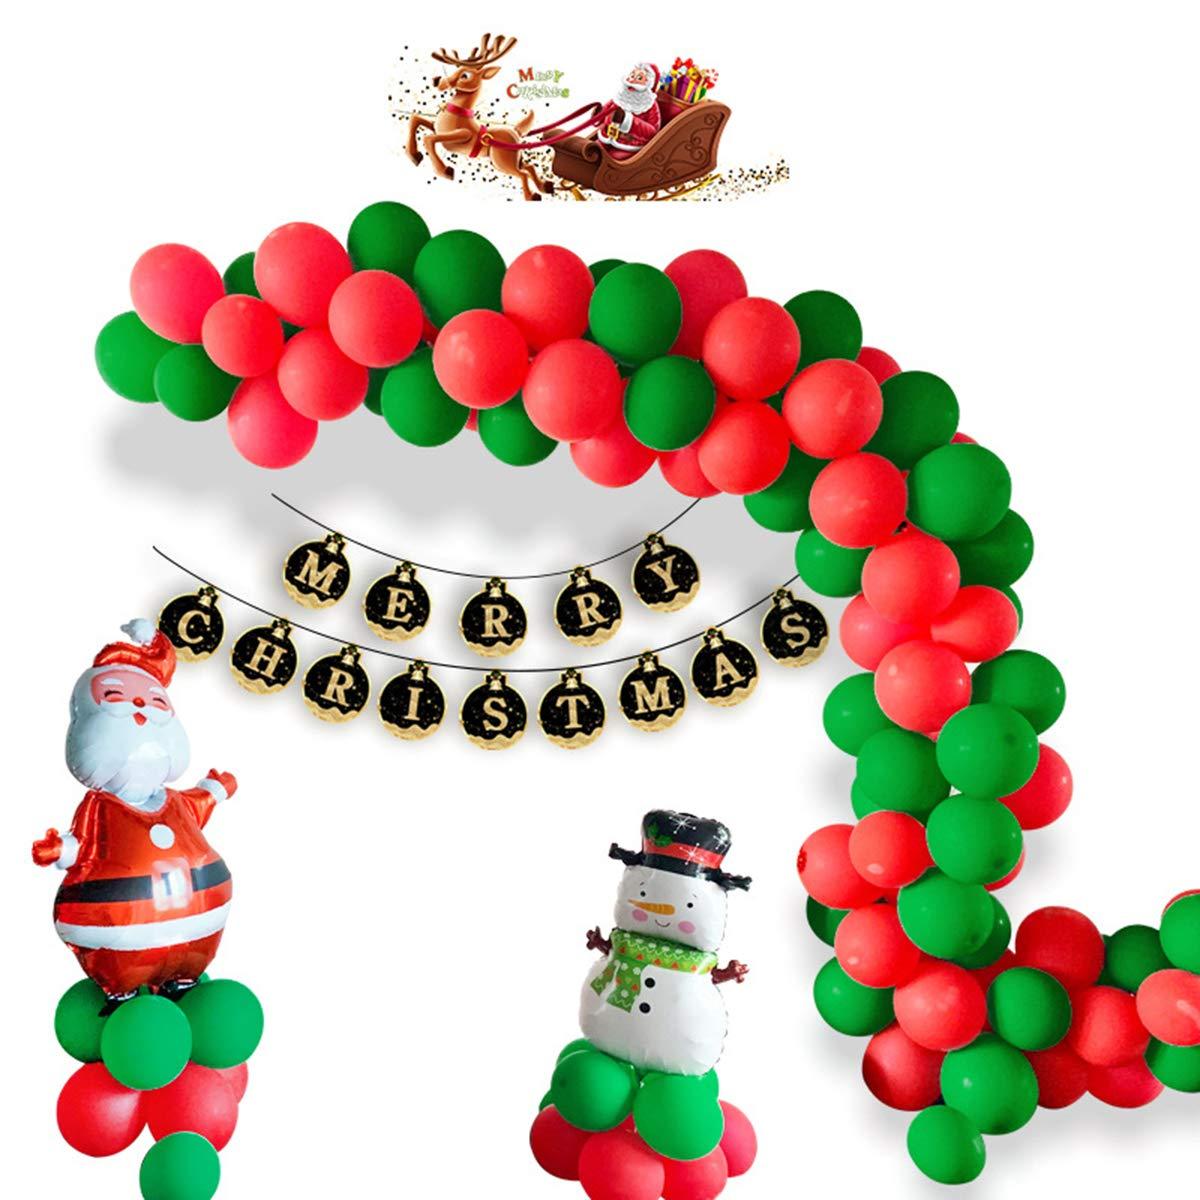 105pcs Yolispa Christmas Party Supplies Balloon Decorations Snowmann /& Santaa Clauss Balloons Merry Christmas Banner Latex Balloons for Home Office Party Favor Decor